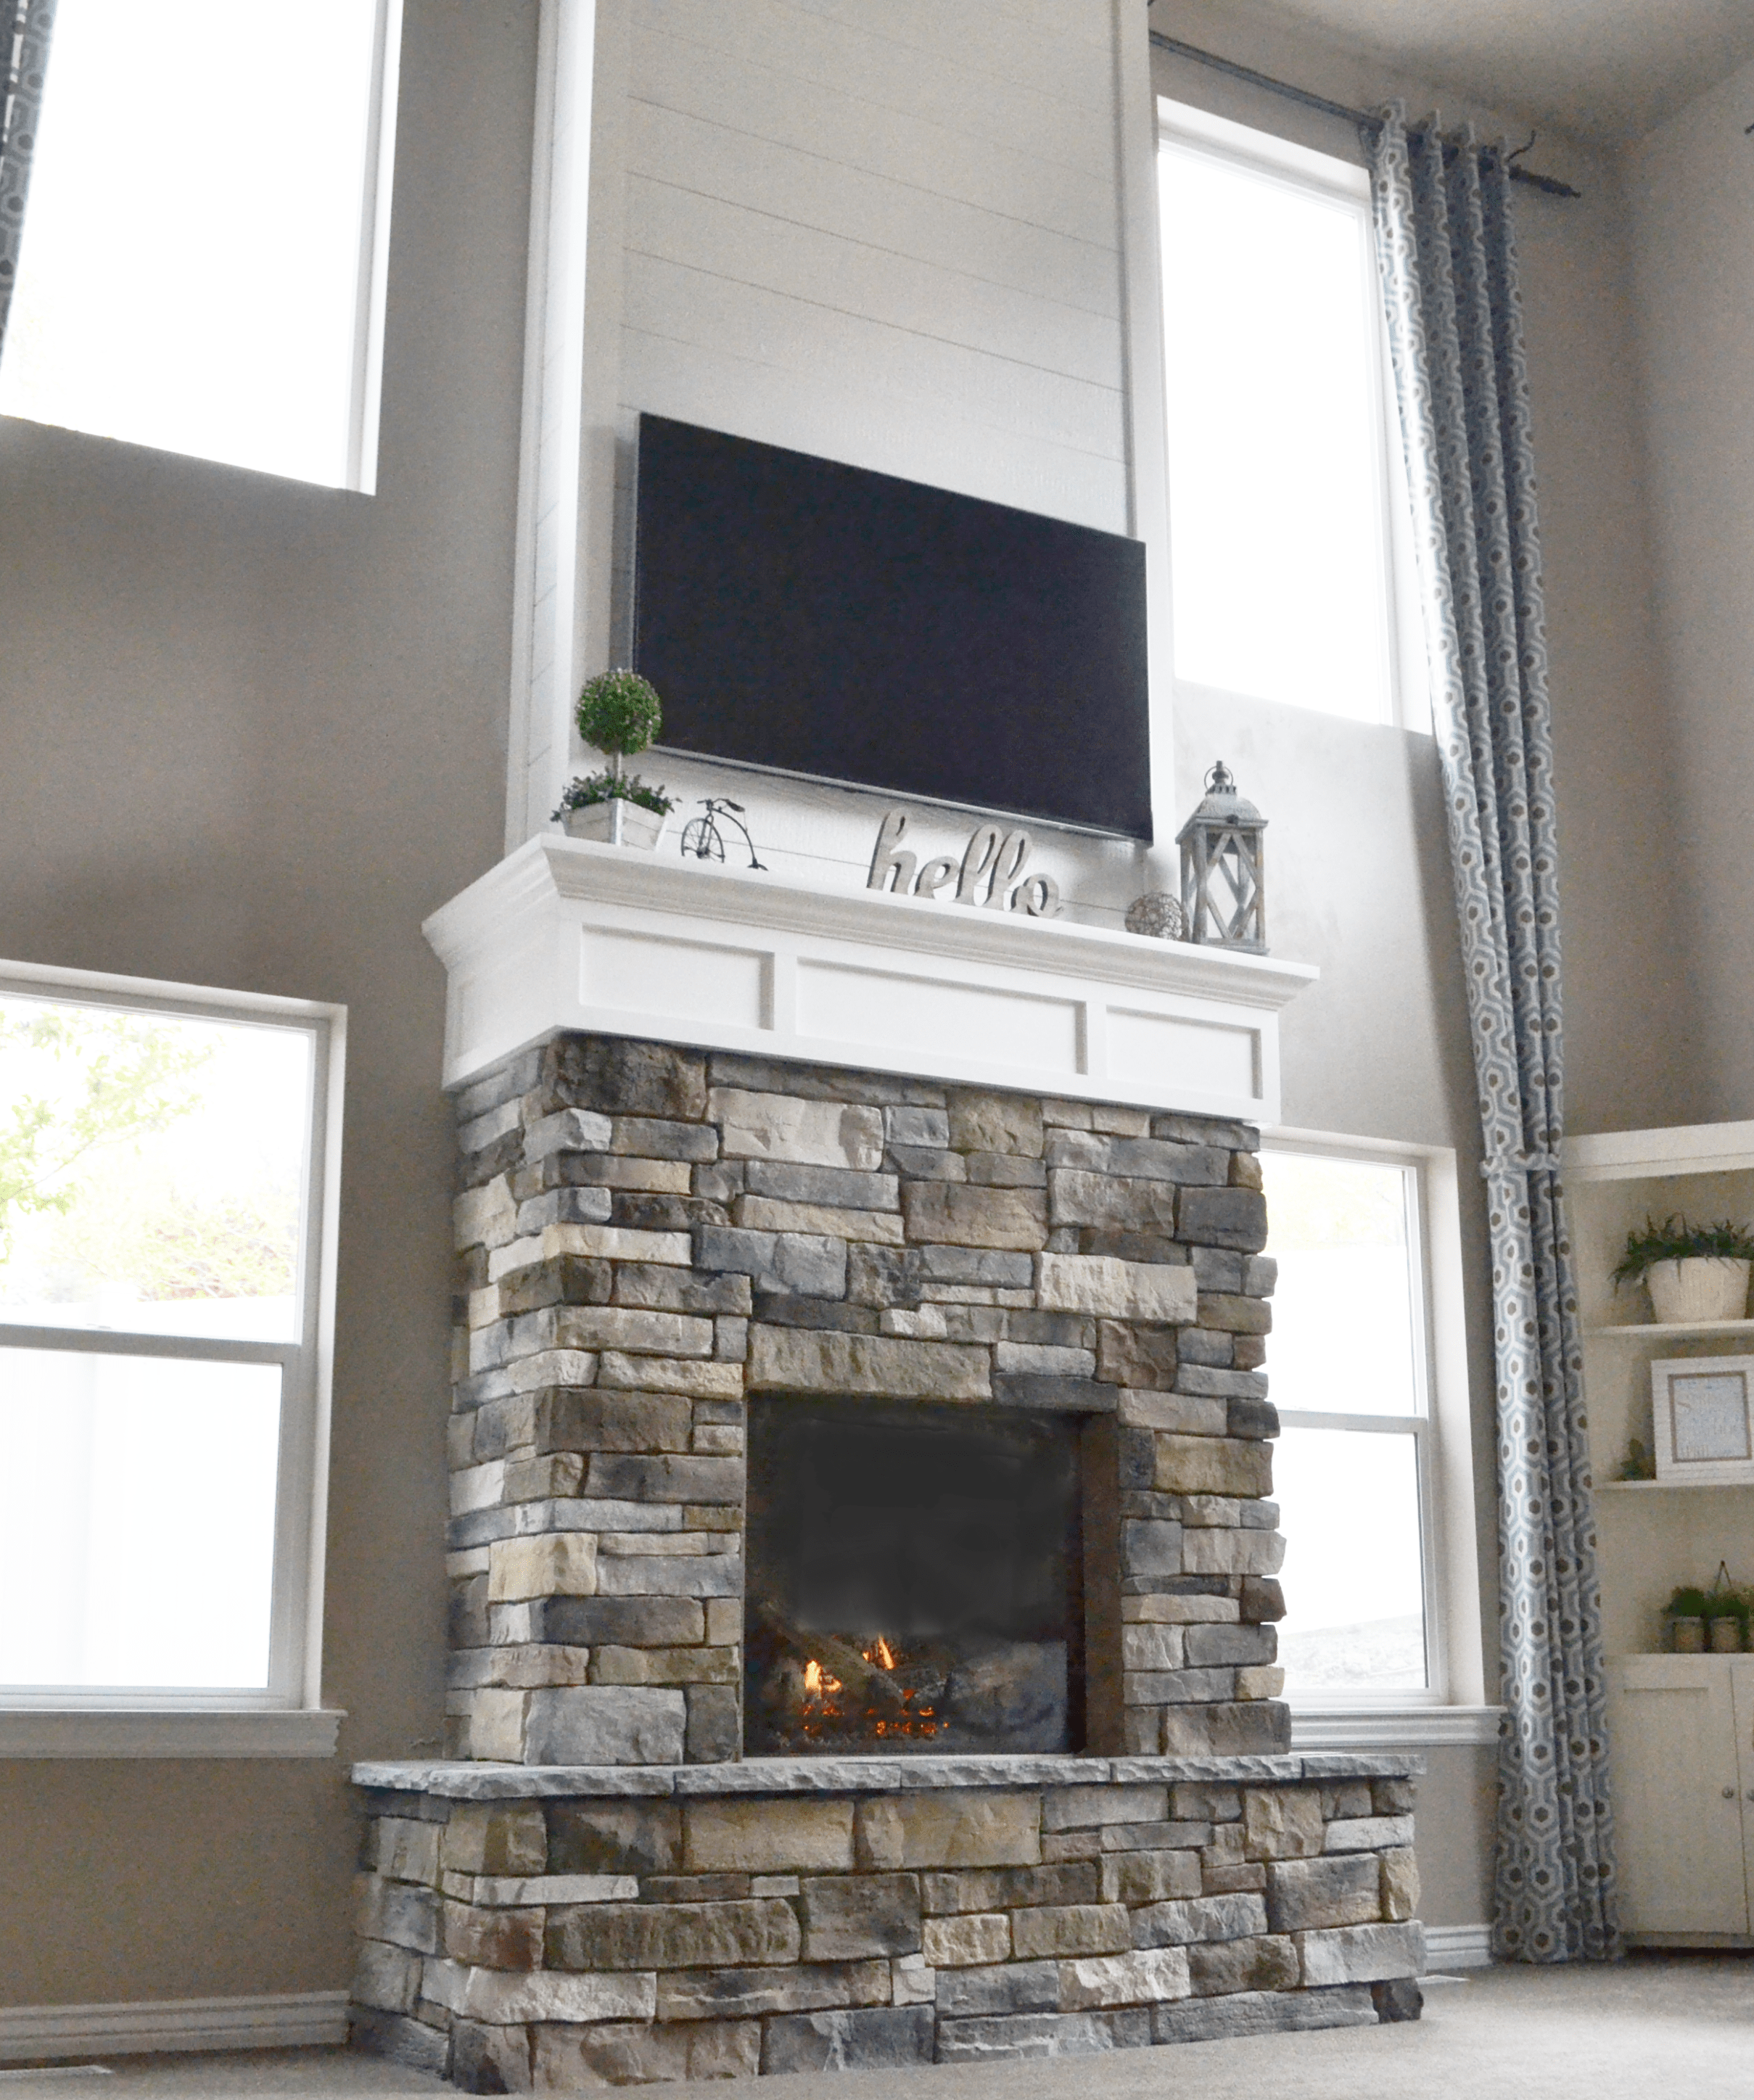 Diy Fireplace Wall Beautiful Diy Fireplace with Stone & Shiplap